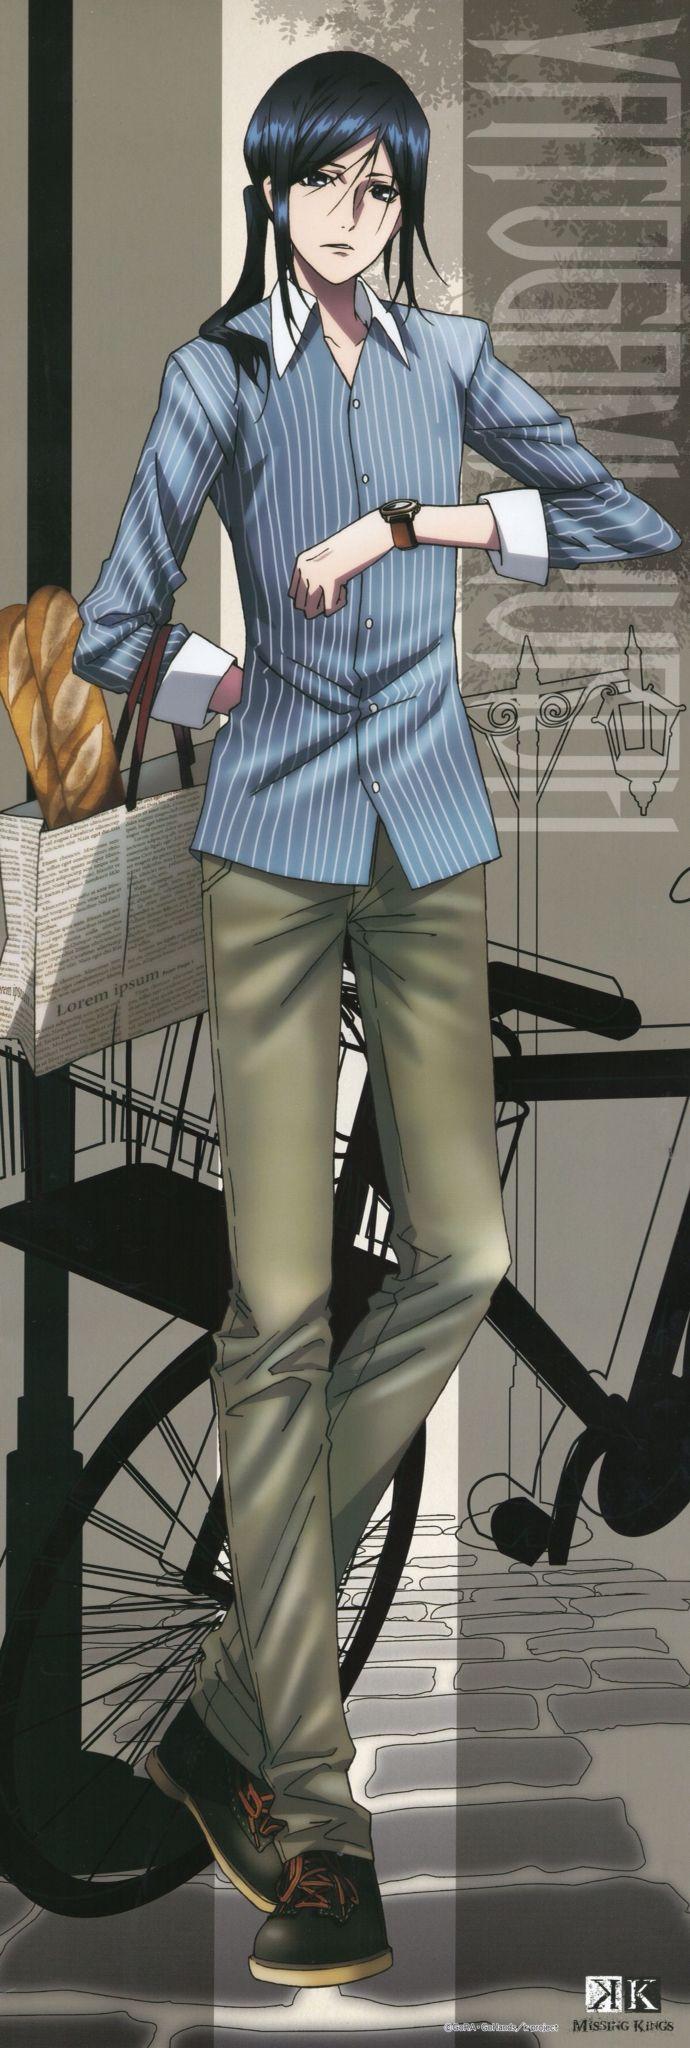 "Yatogami Kuroh. K ""Project"". K ""Missing Kings"". #anime."